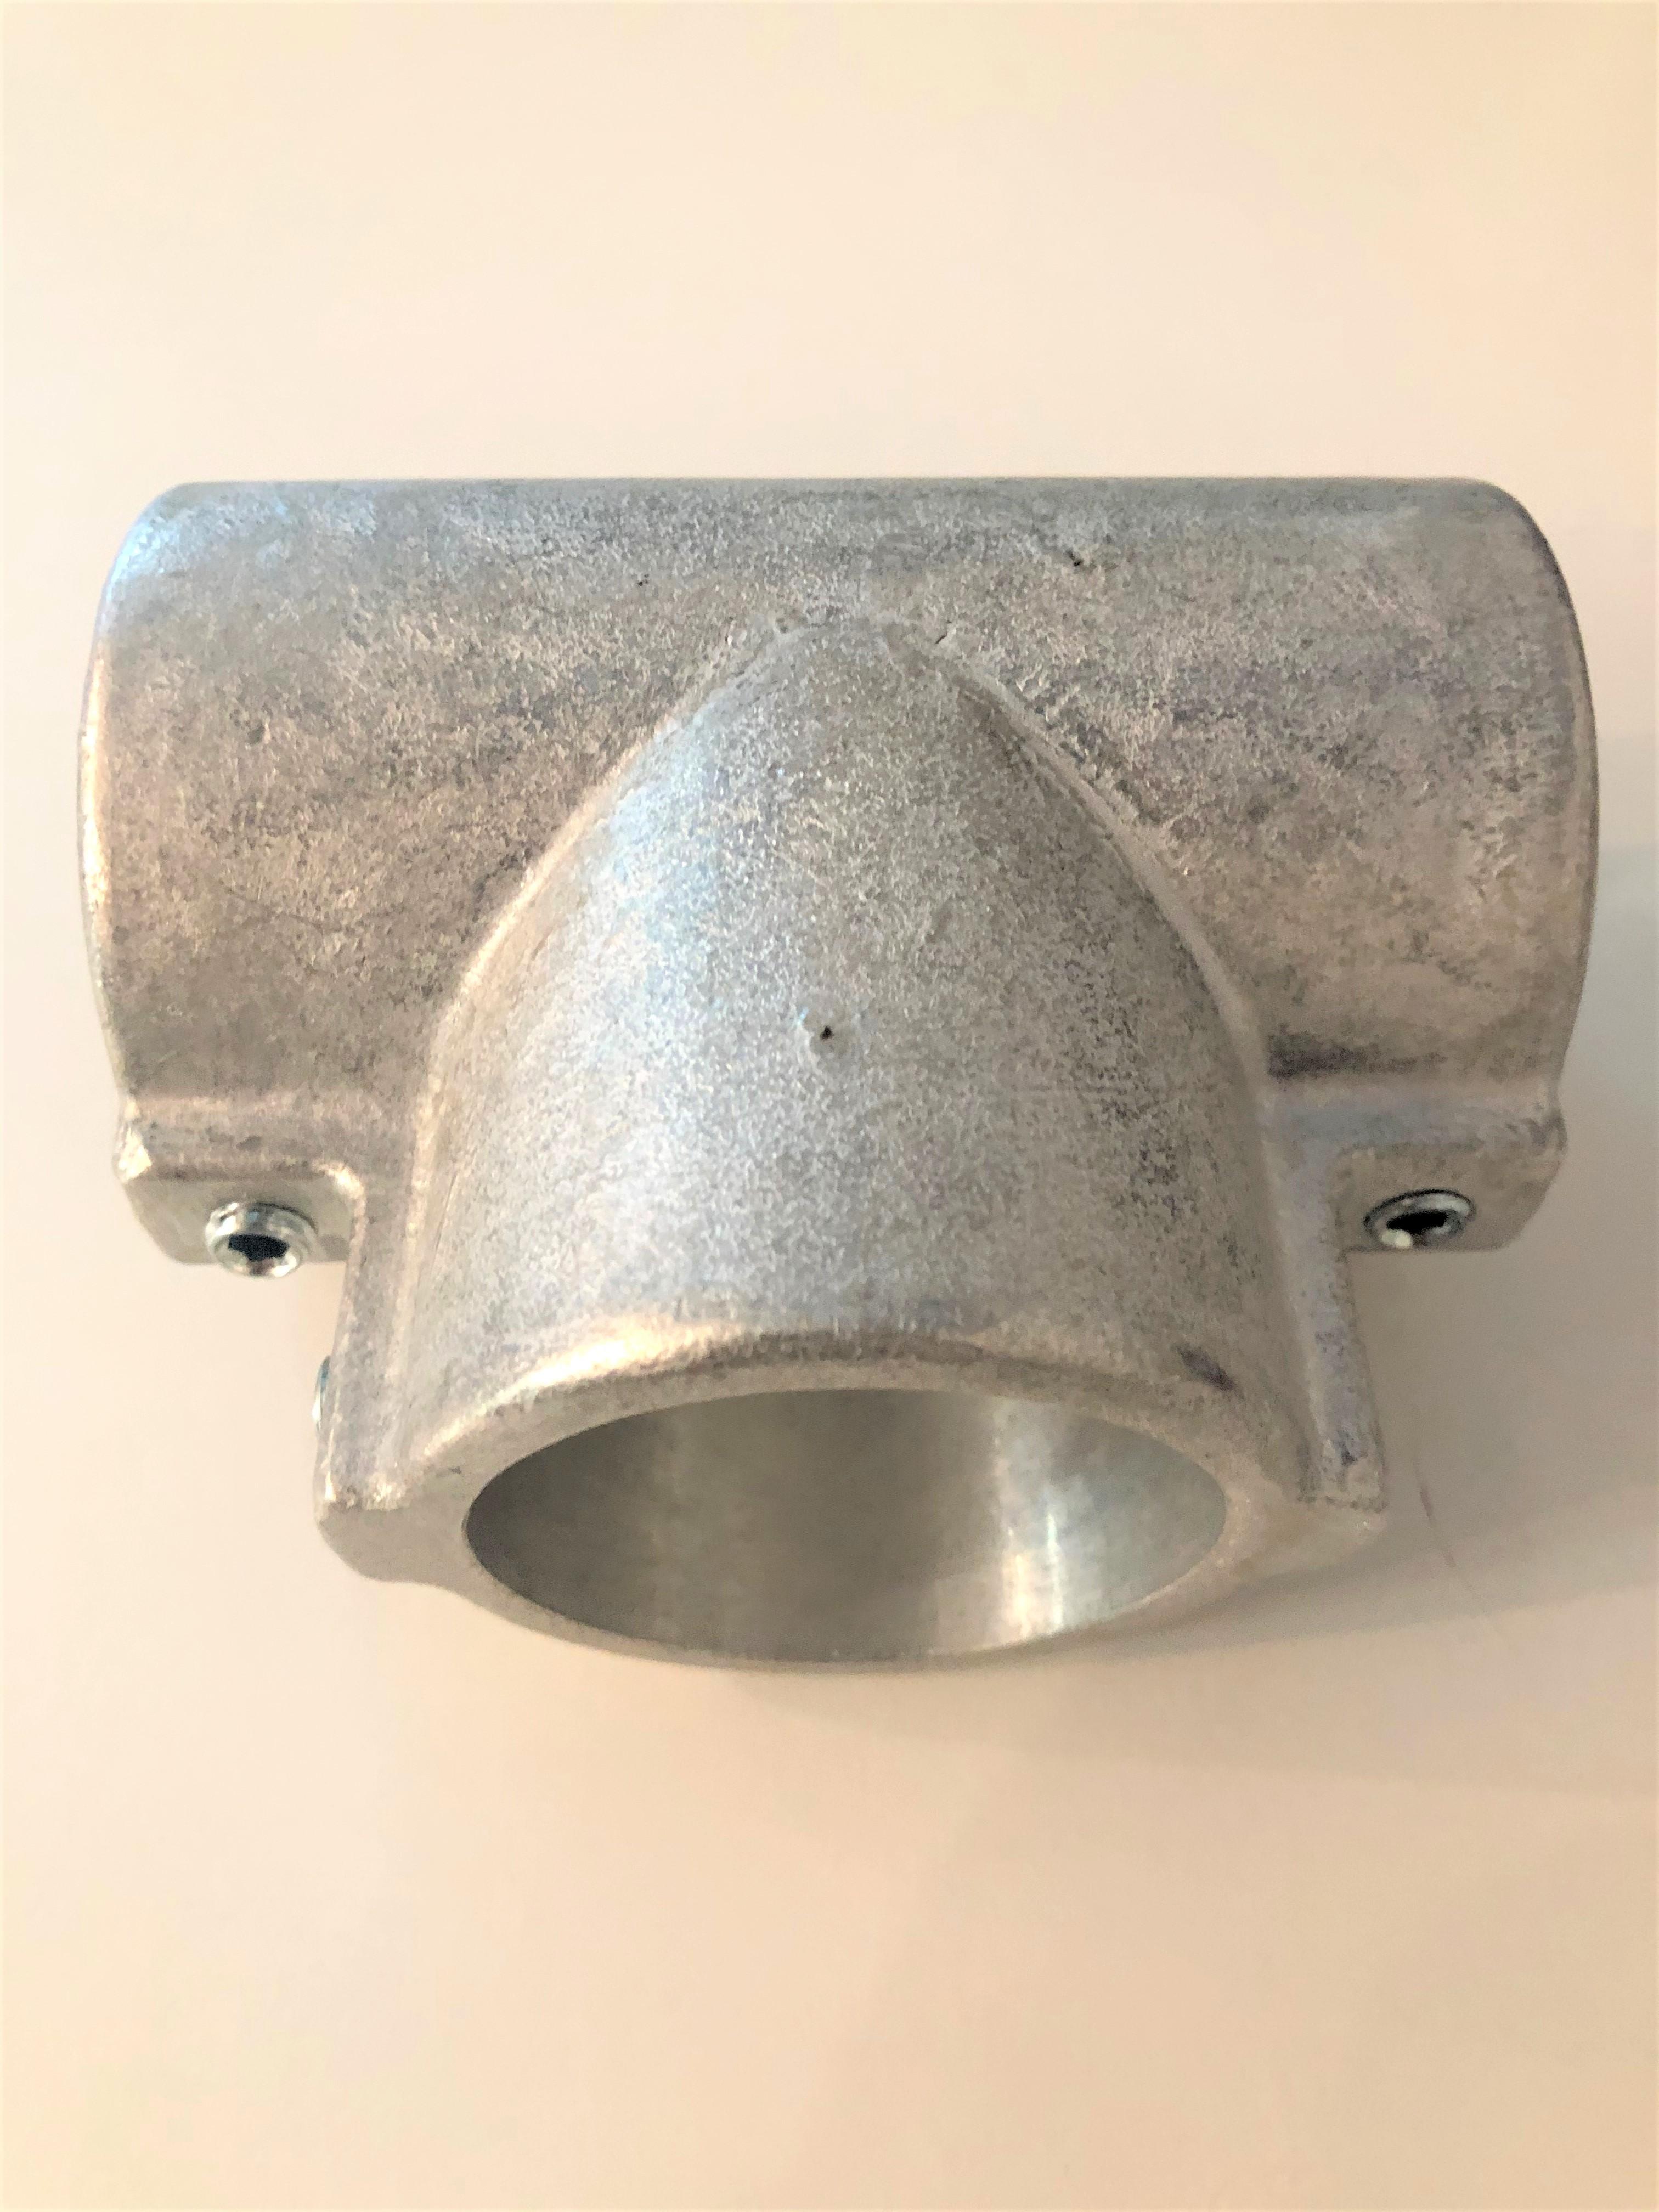 T-Verbinder 90° - lang, 60mm, Alu roh unbehandelt